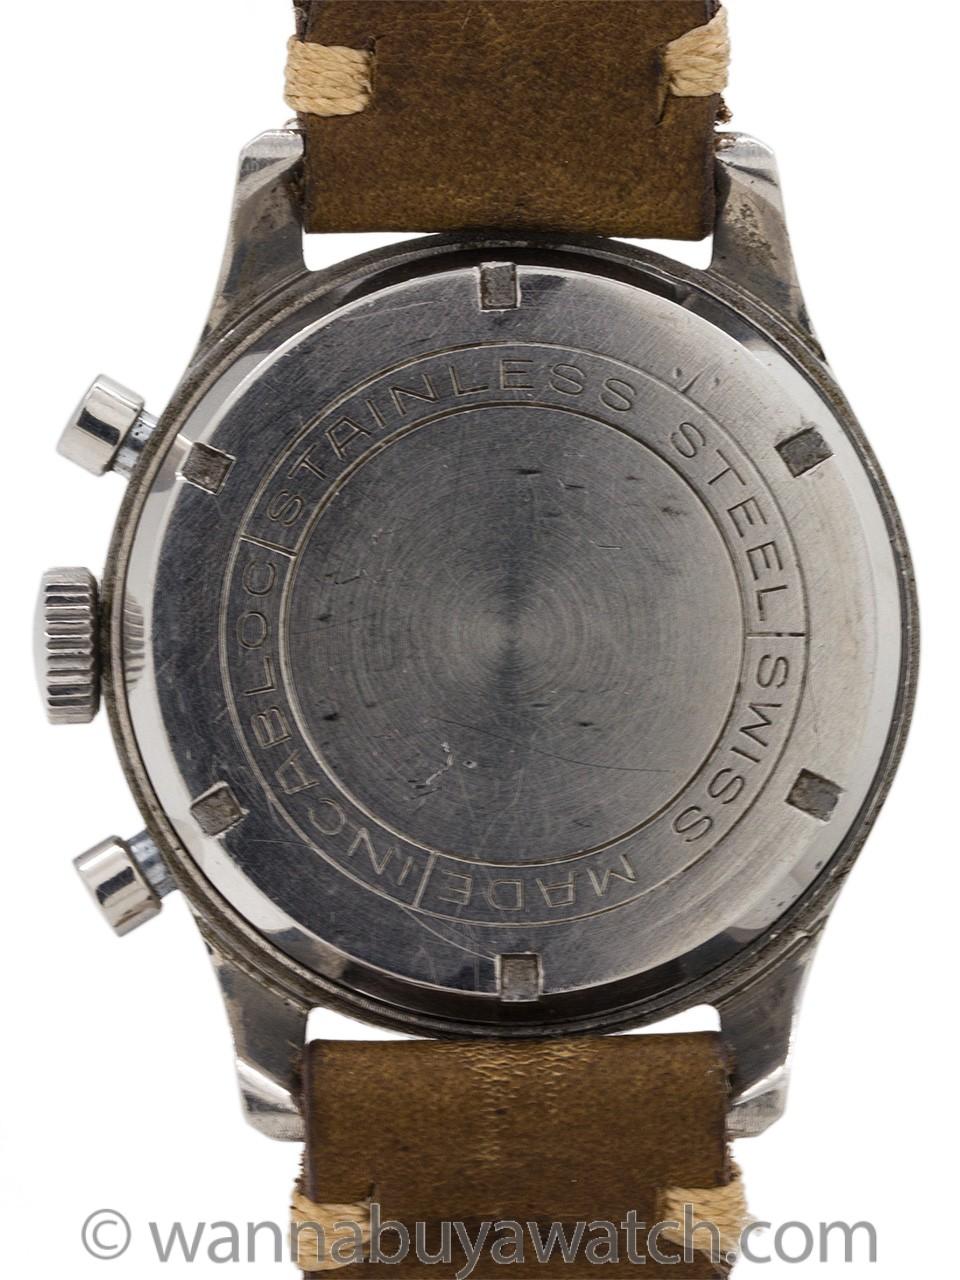 Croton Chronograph circa 1950's Valjoux 72